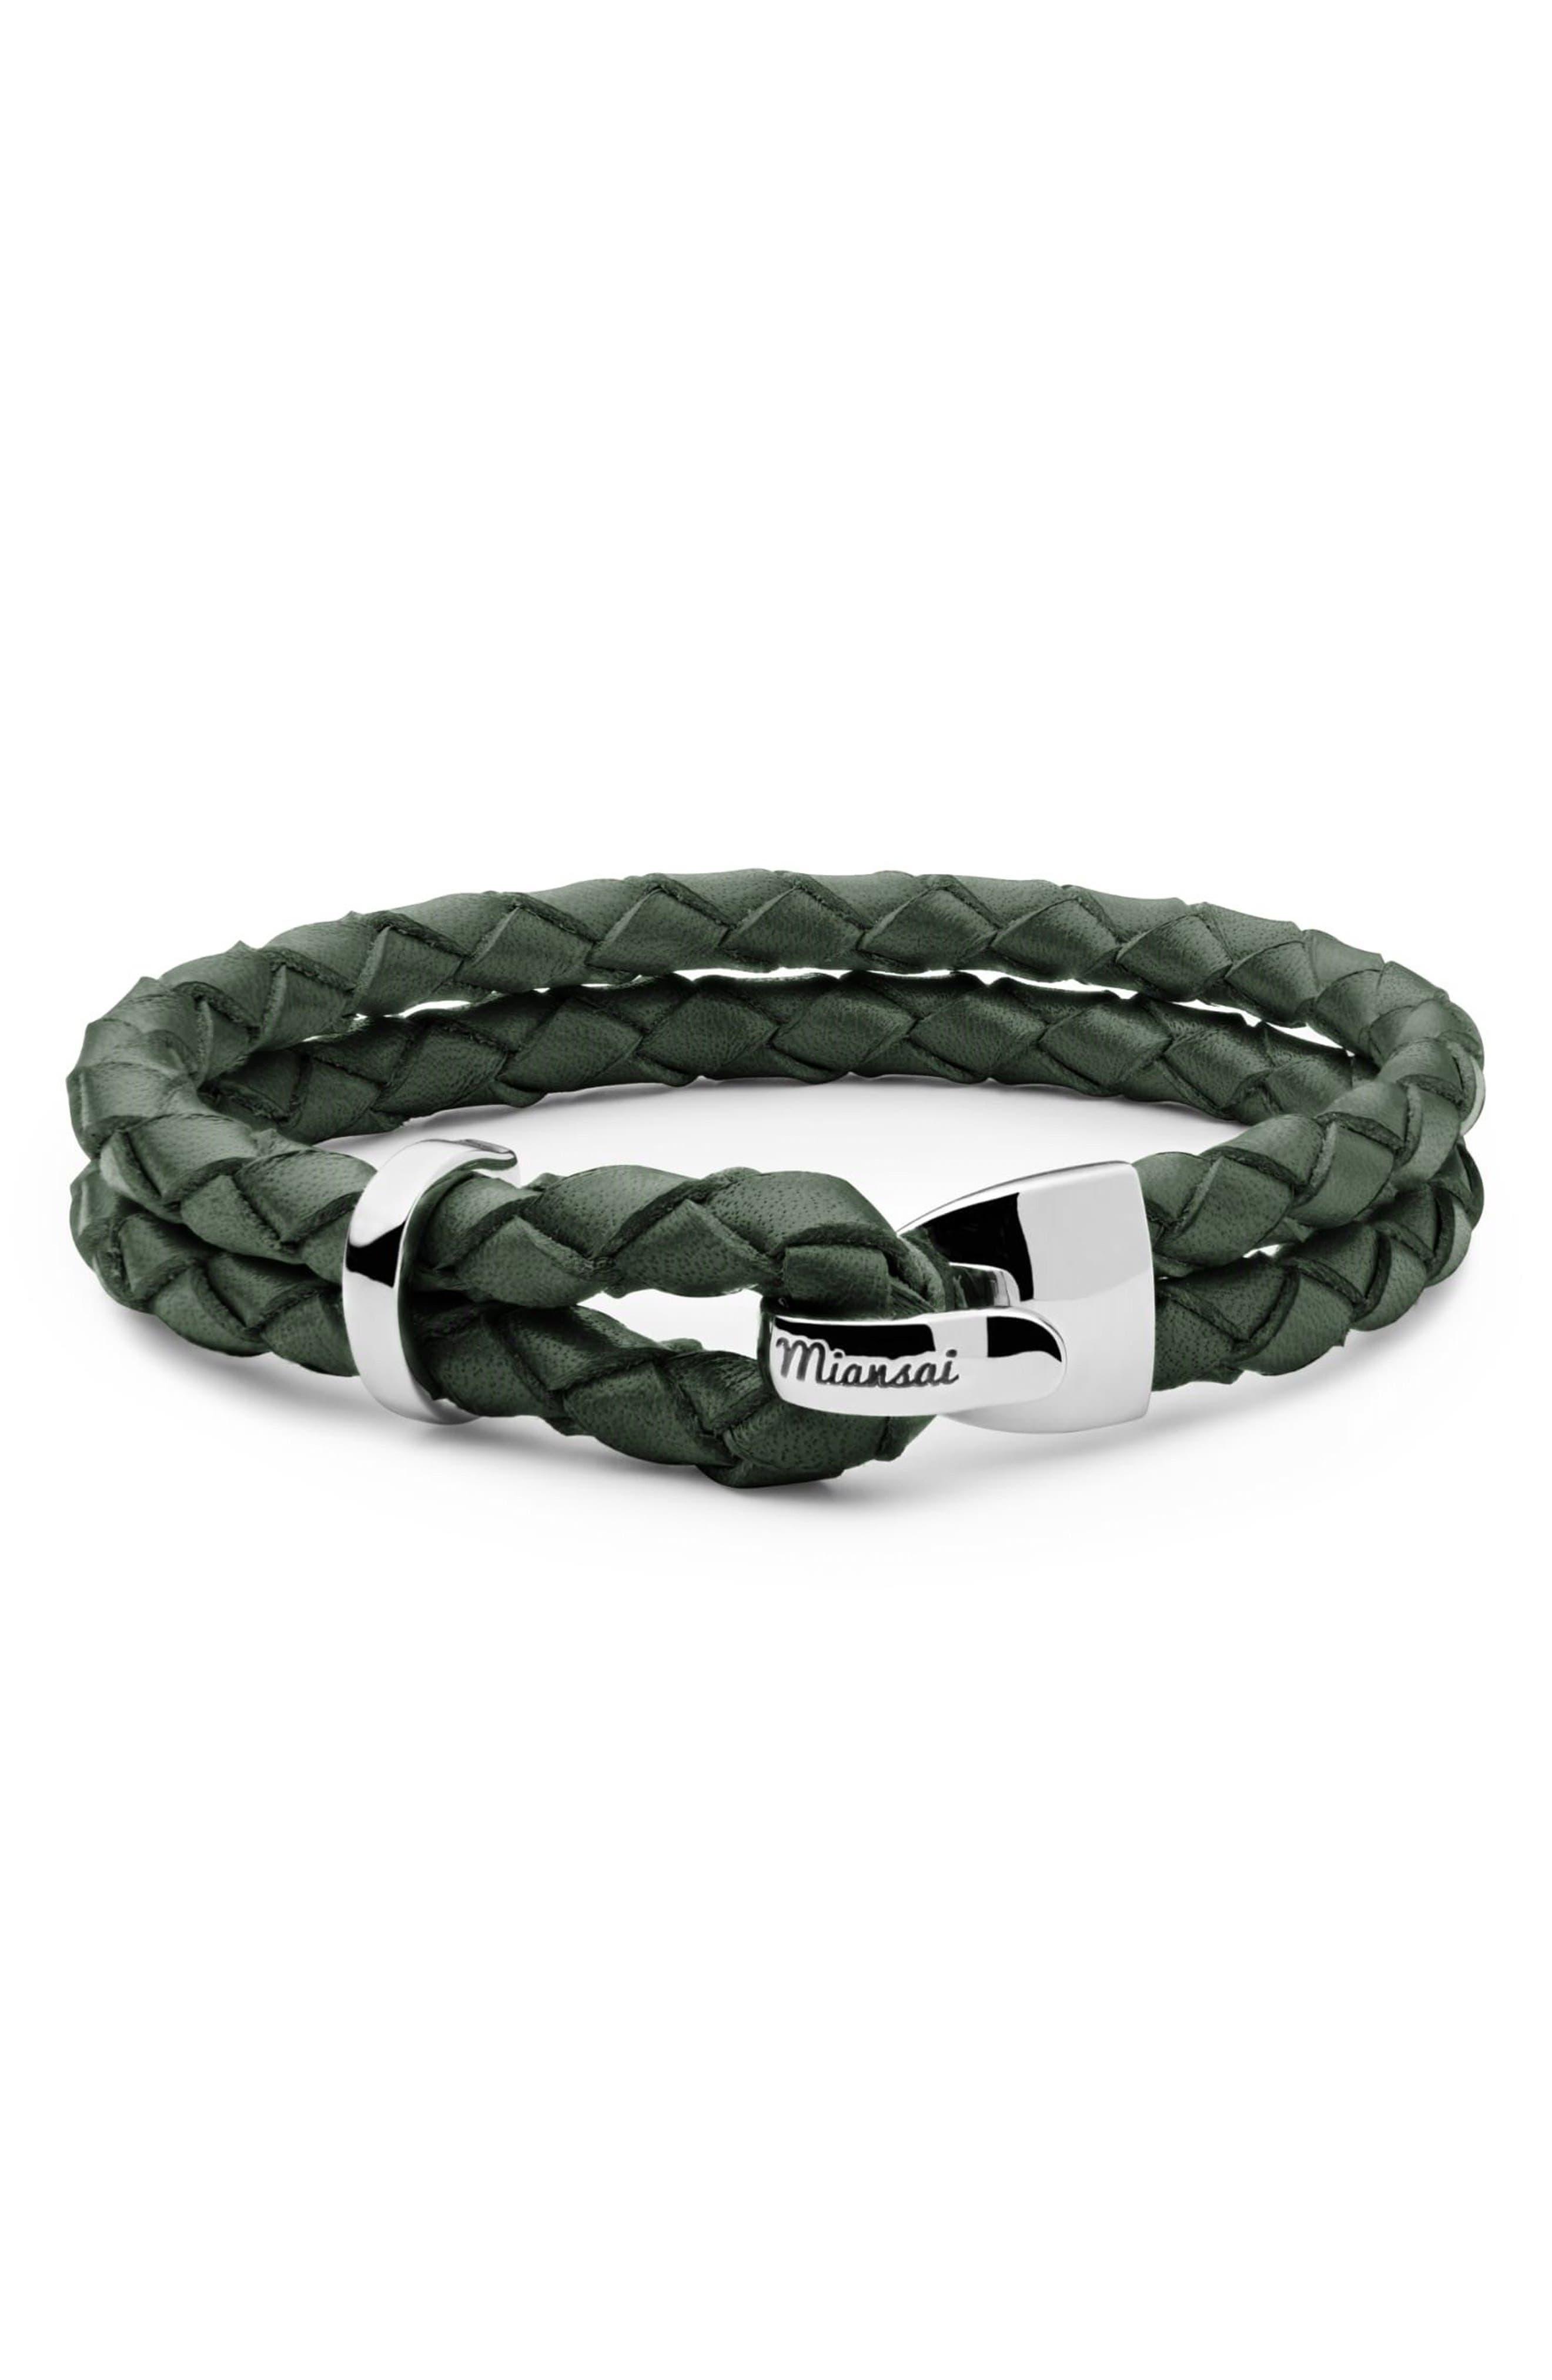 Beacon Braided Leather Bracelet,                             Main thumbnail 1, color,                             301